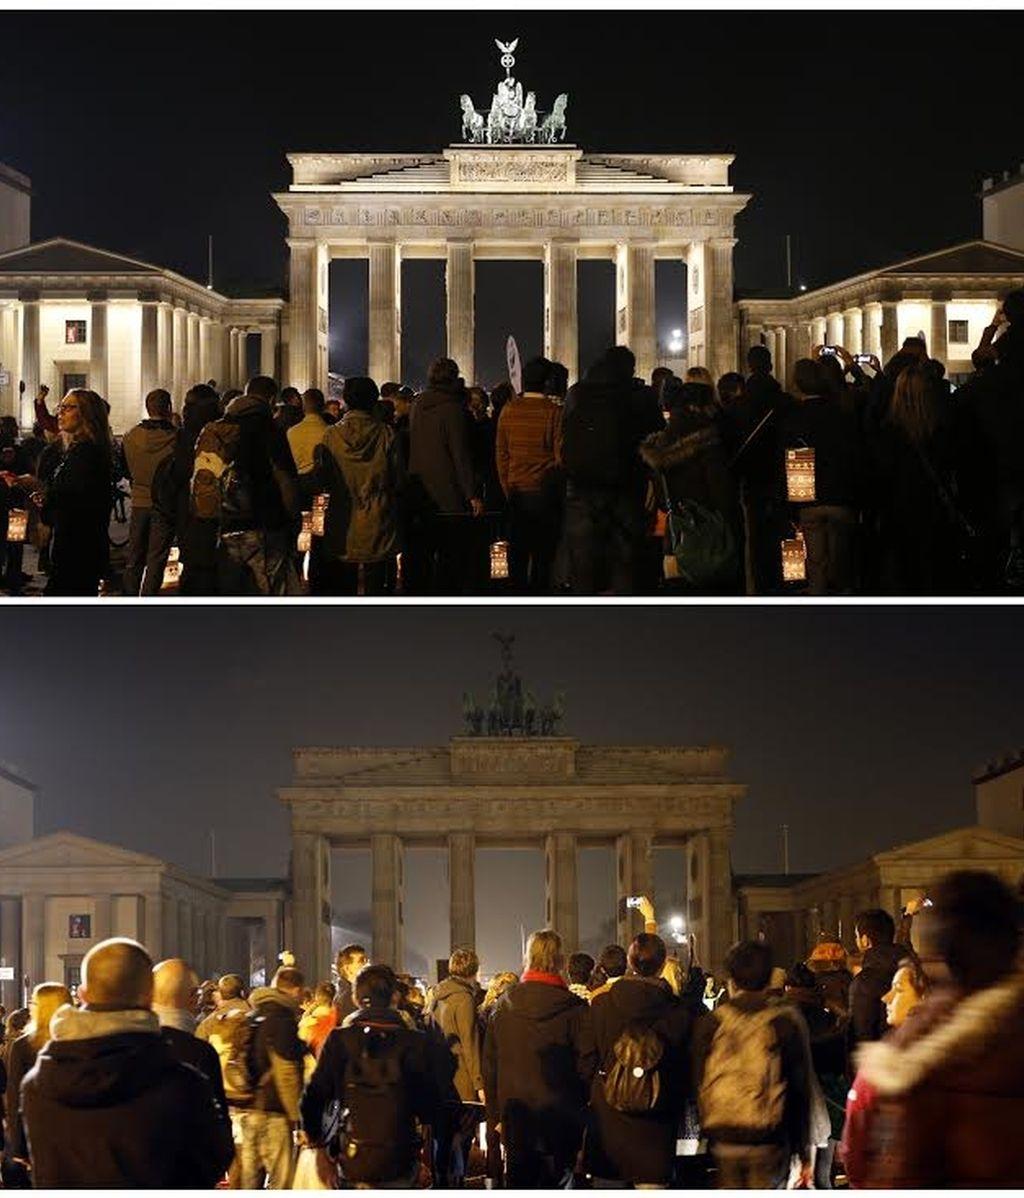 La Puerta de Bradenburgo en Berlín